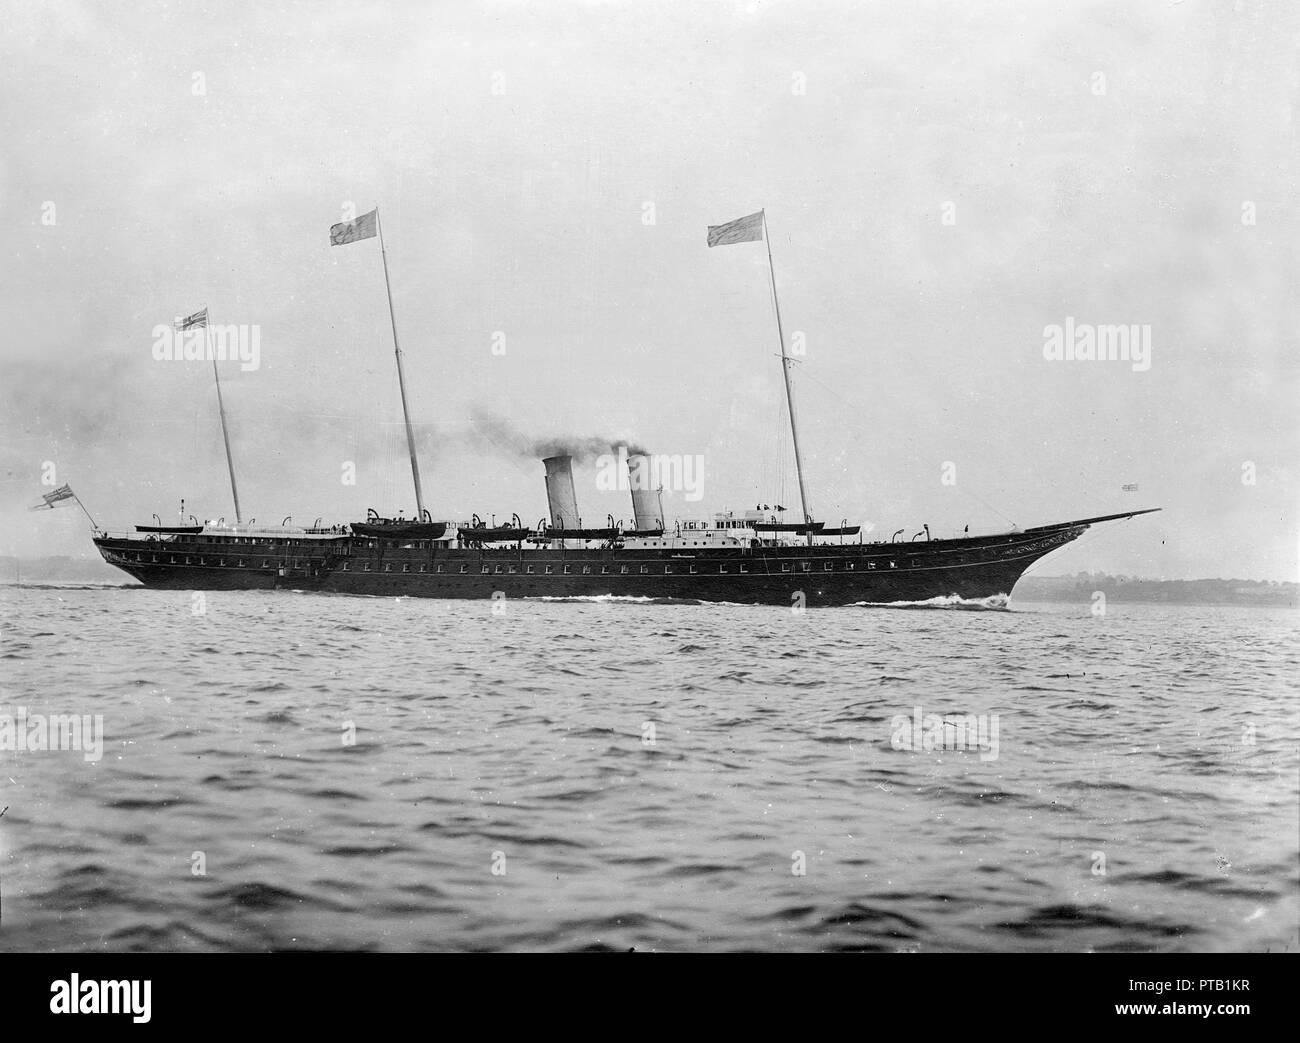 d441b1e928f The Royal Yacht  HMY Victoria and Albert  (1899).  HMY Victoria